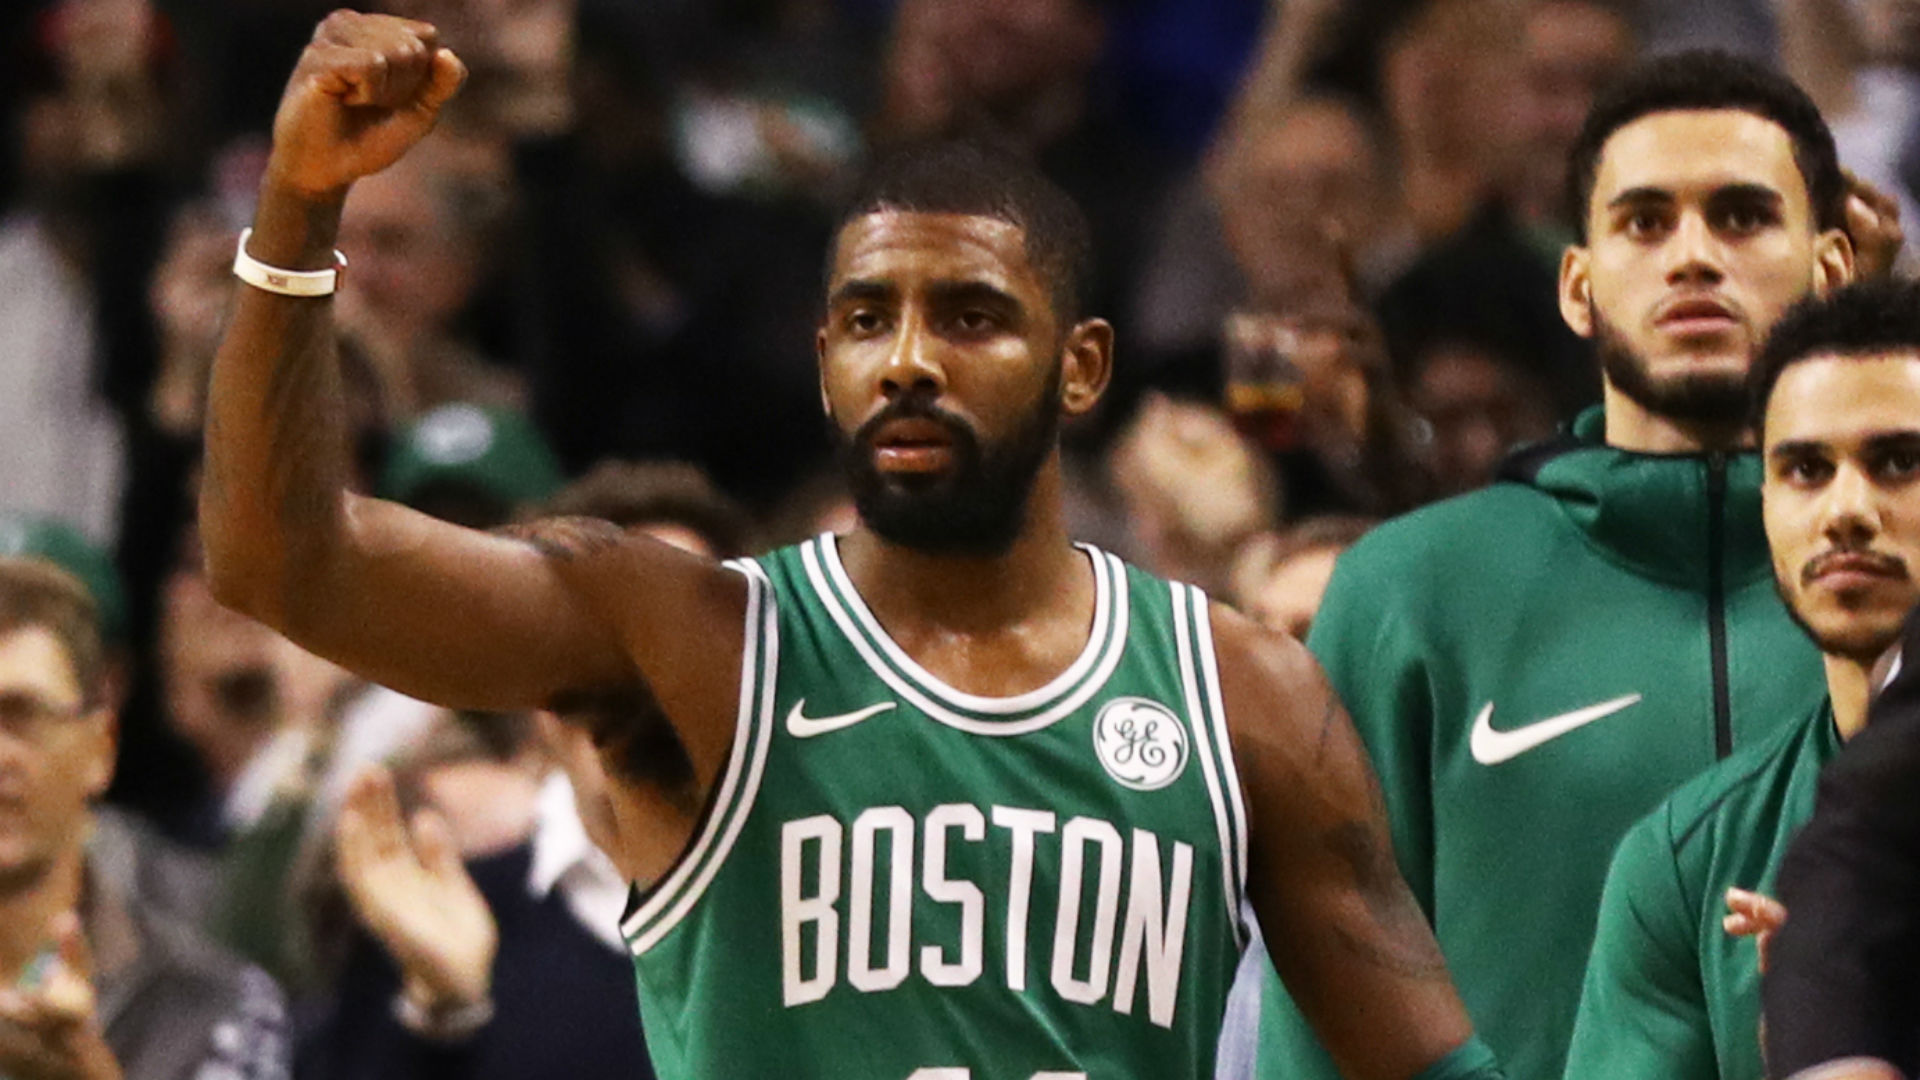 NBA wrap: Celtics outlast Warriors for 14th straight win